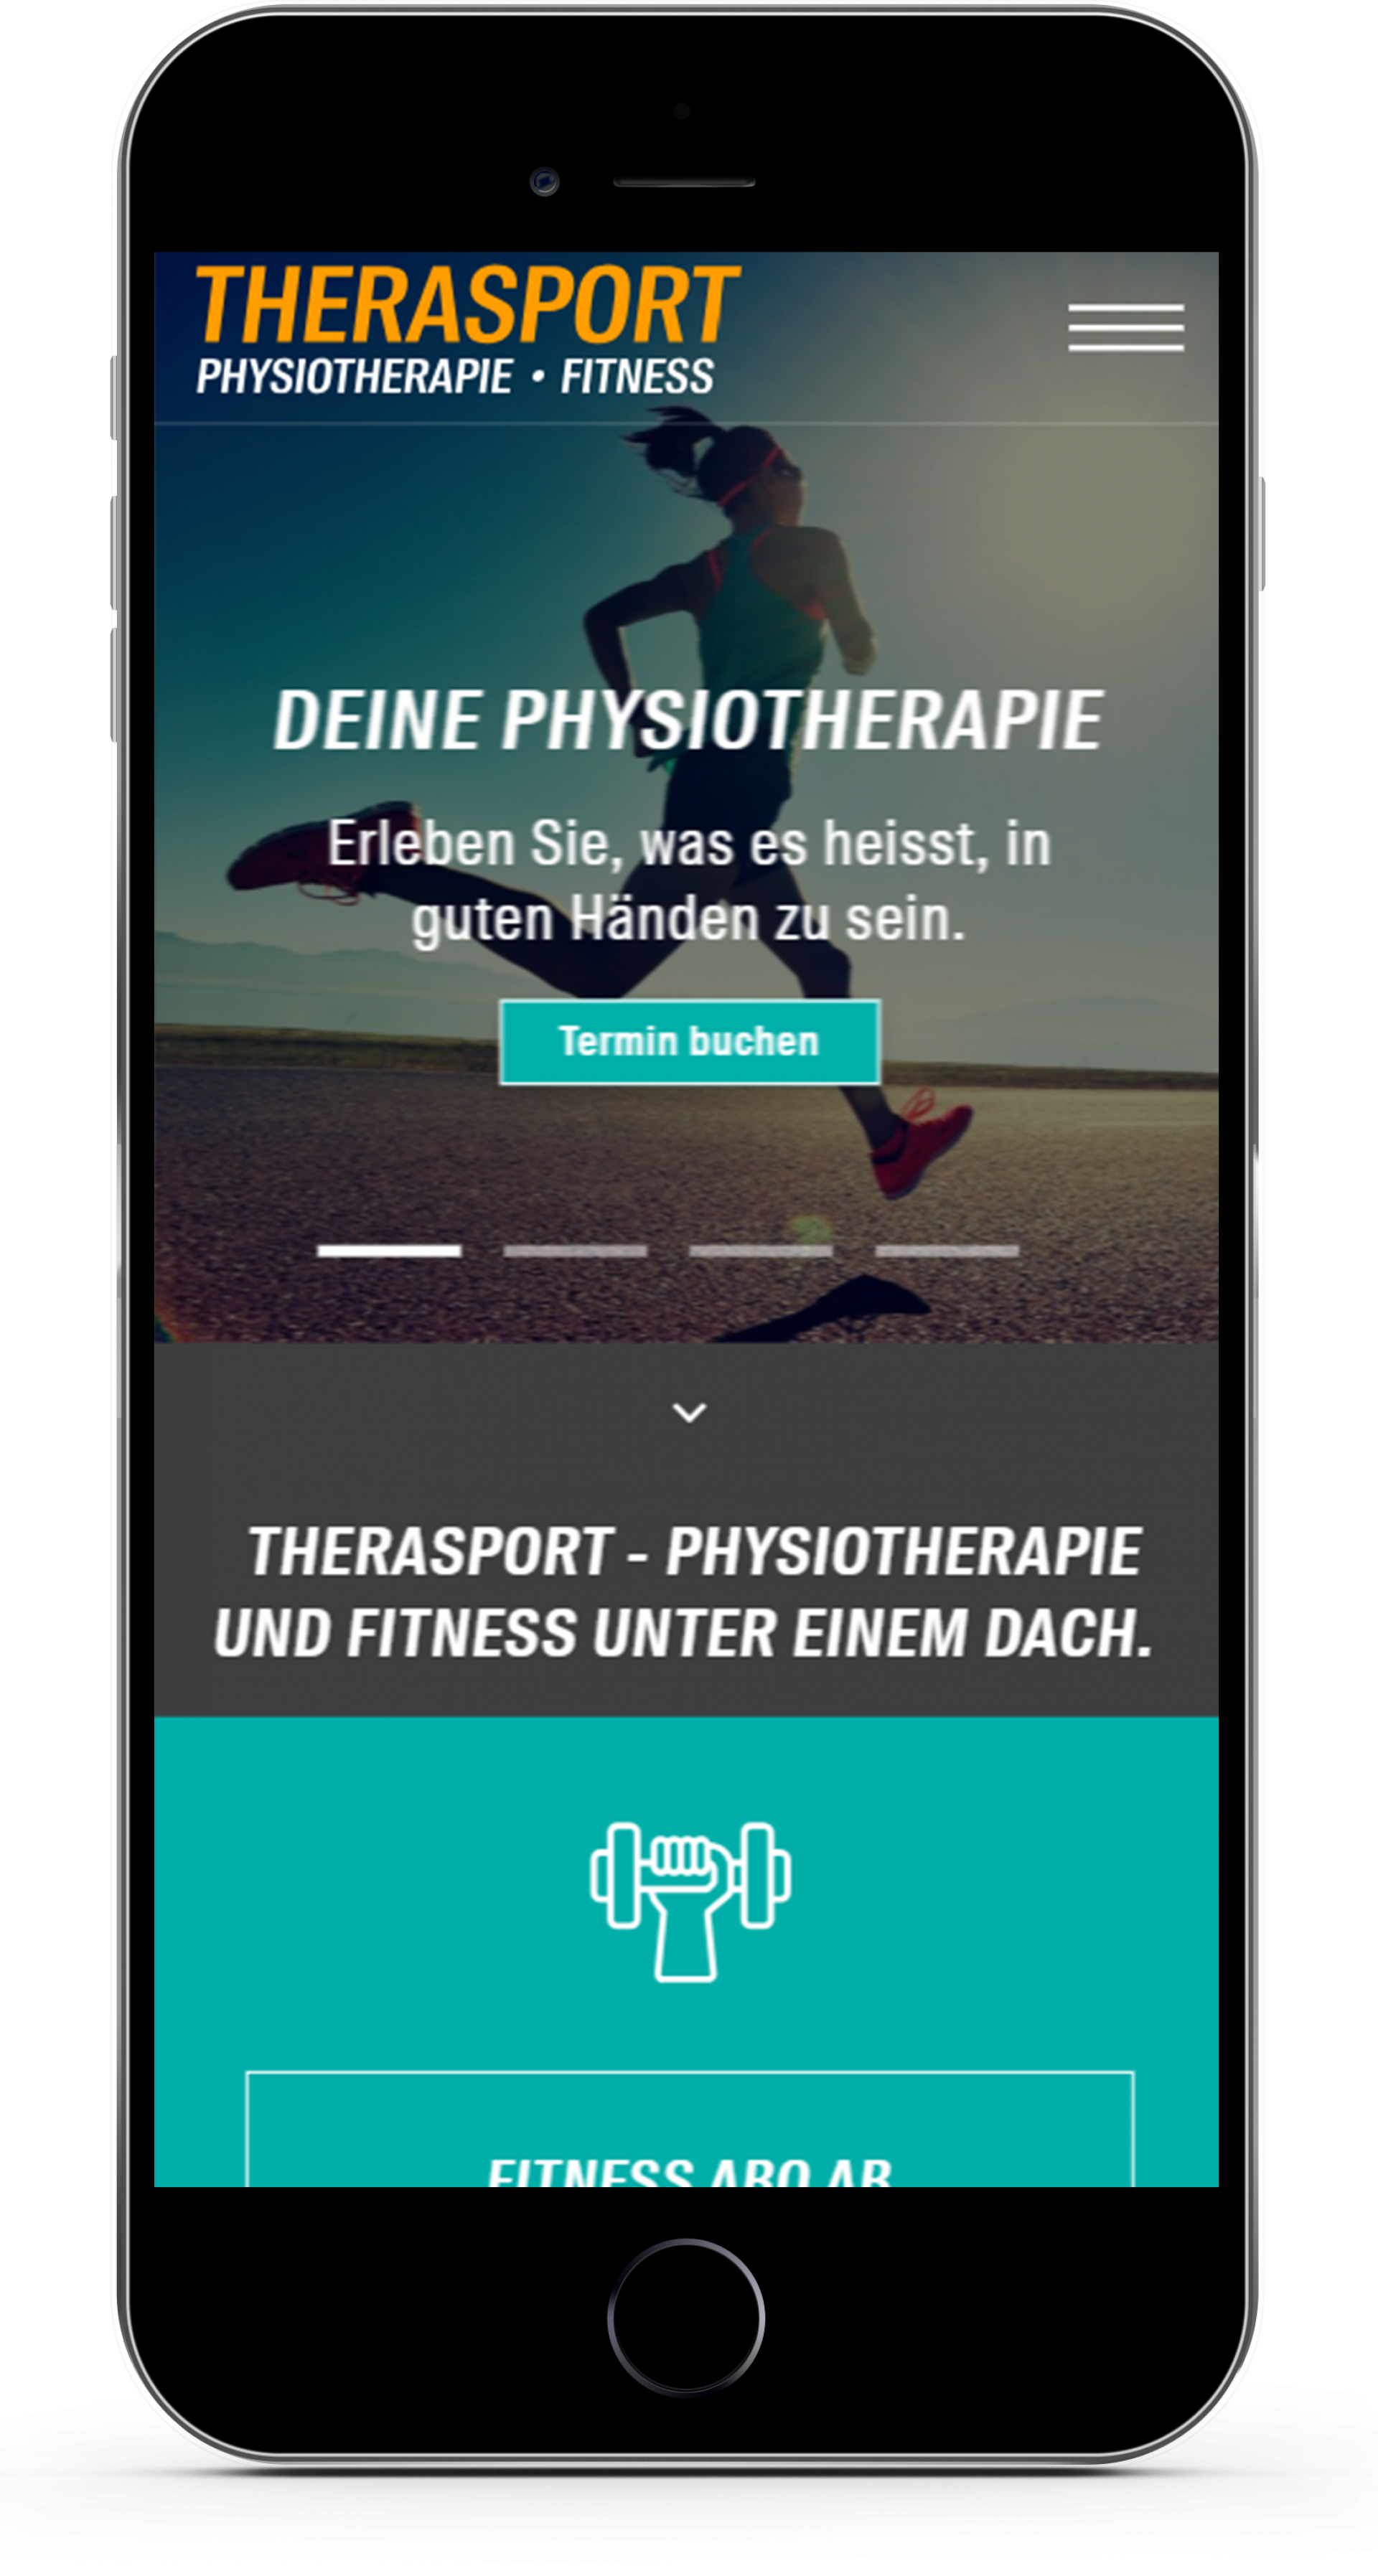 Therasport Mobile Homepage Design